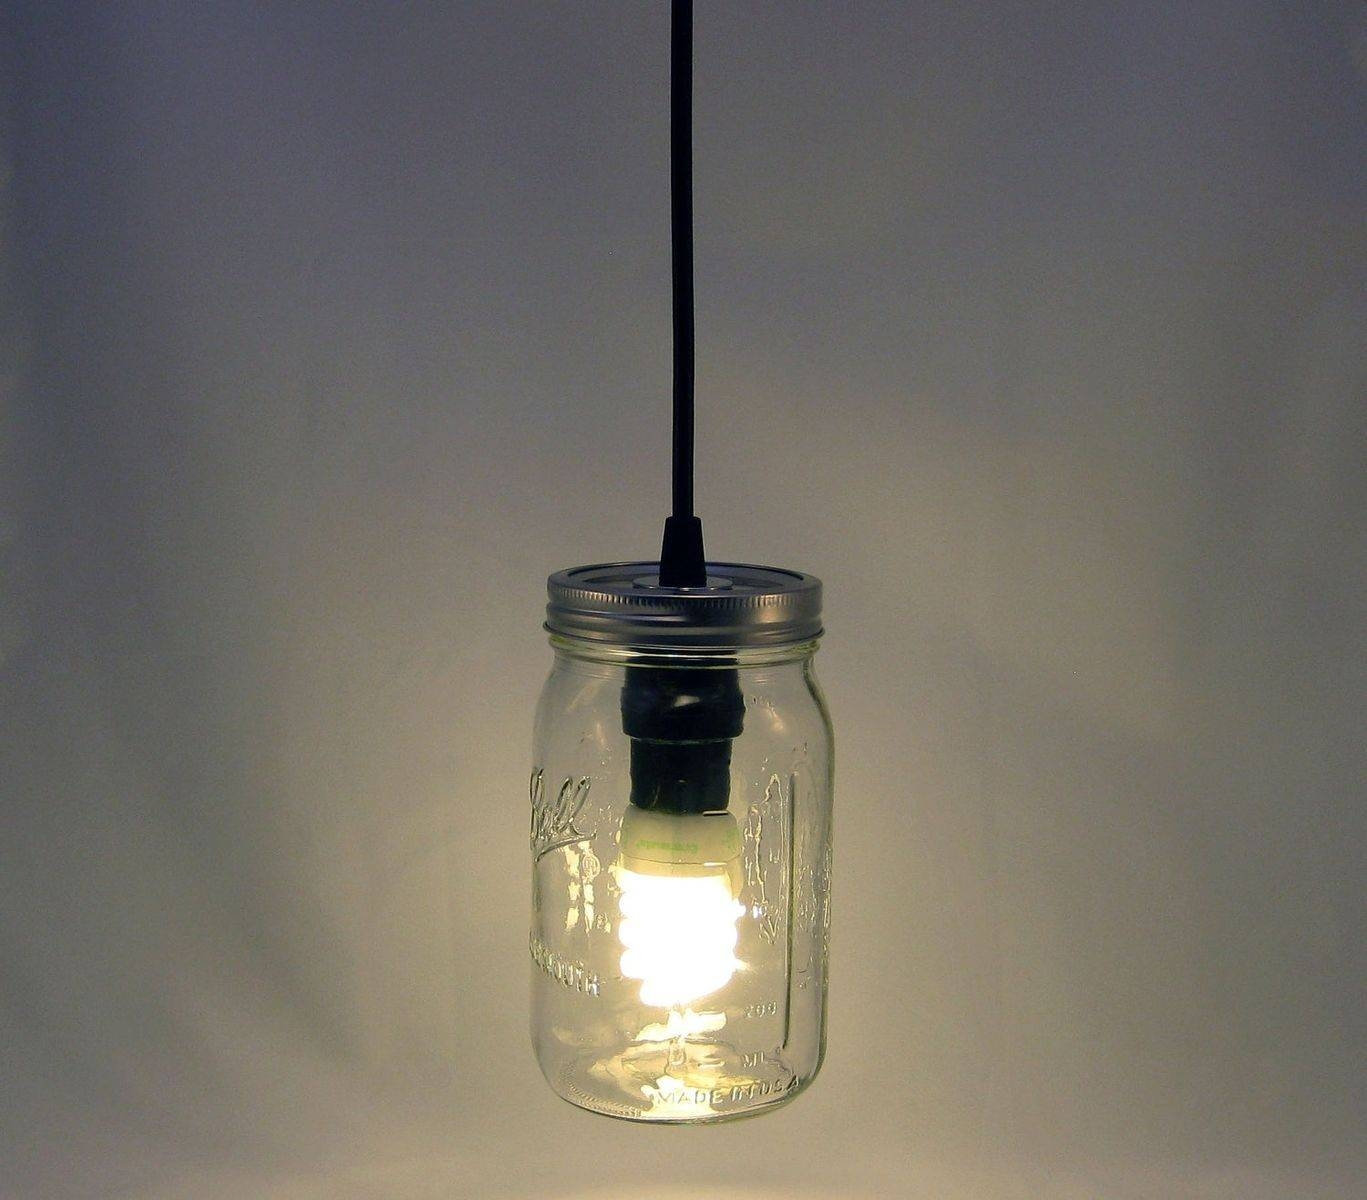 Custom Ball Mason Jar Hanging Pendant Light - Bmql-Svtmilton pertaining to Ball Jar Pendant Lights (Image 7 of 15)